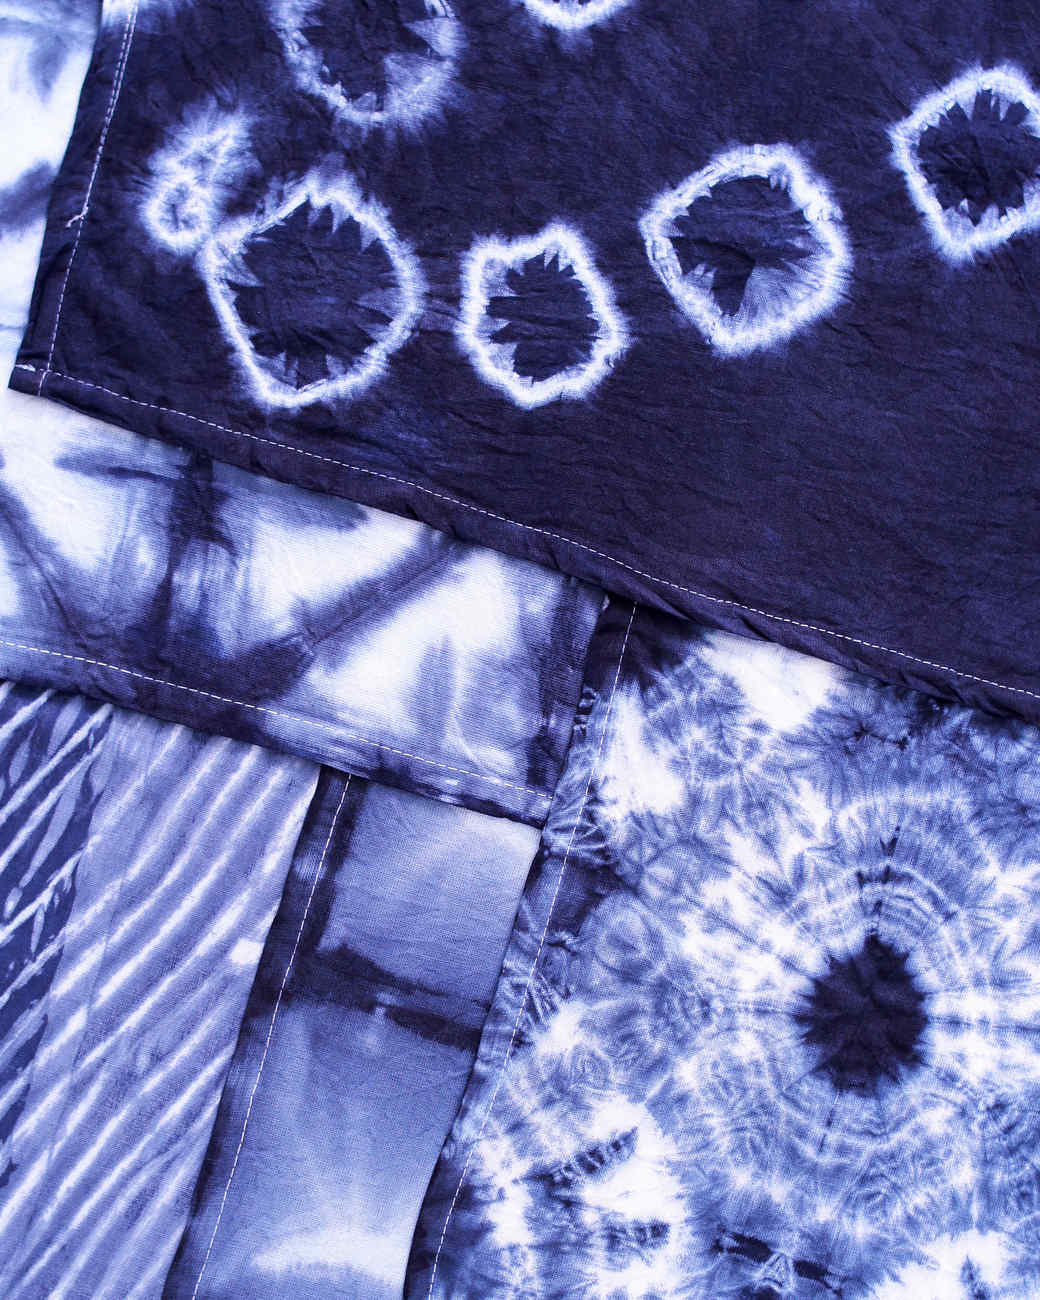 assortment of layered blue dyed fabrics